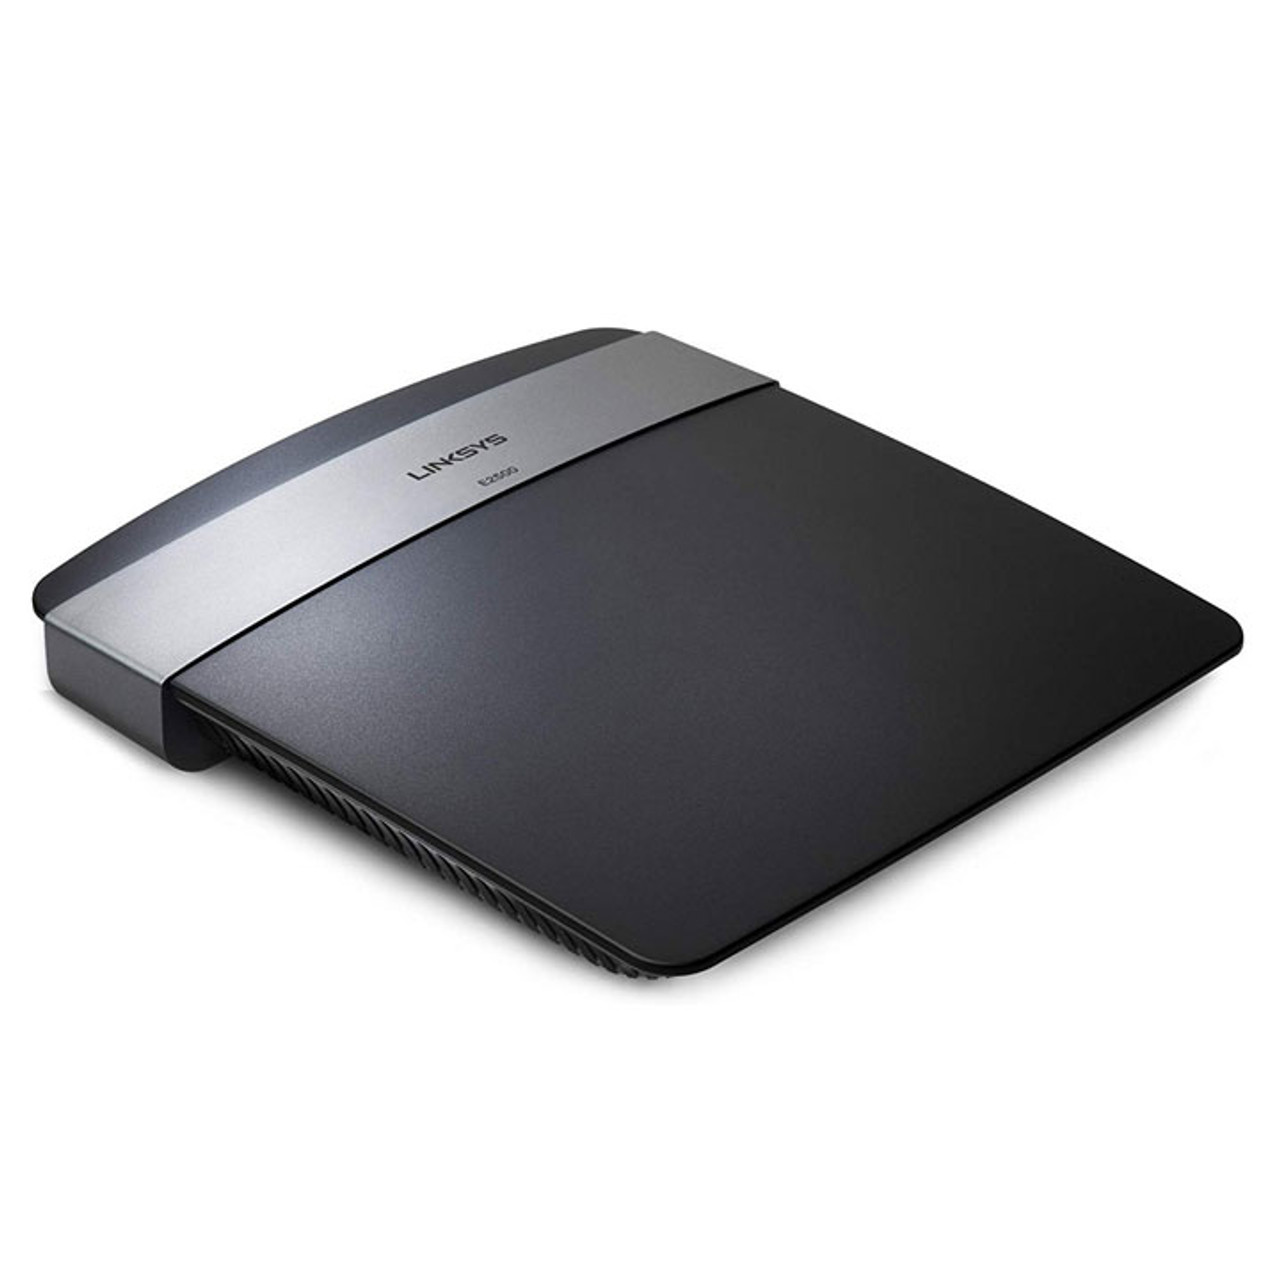 Linksys E2500 powered by Sabai OS